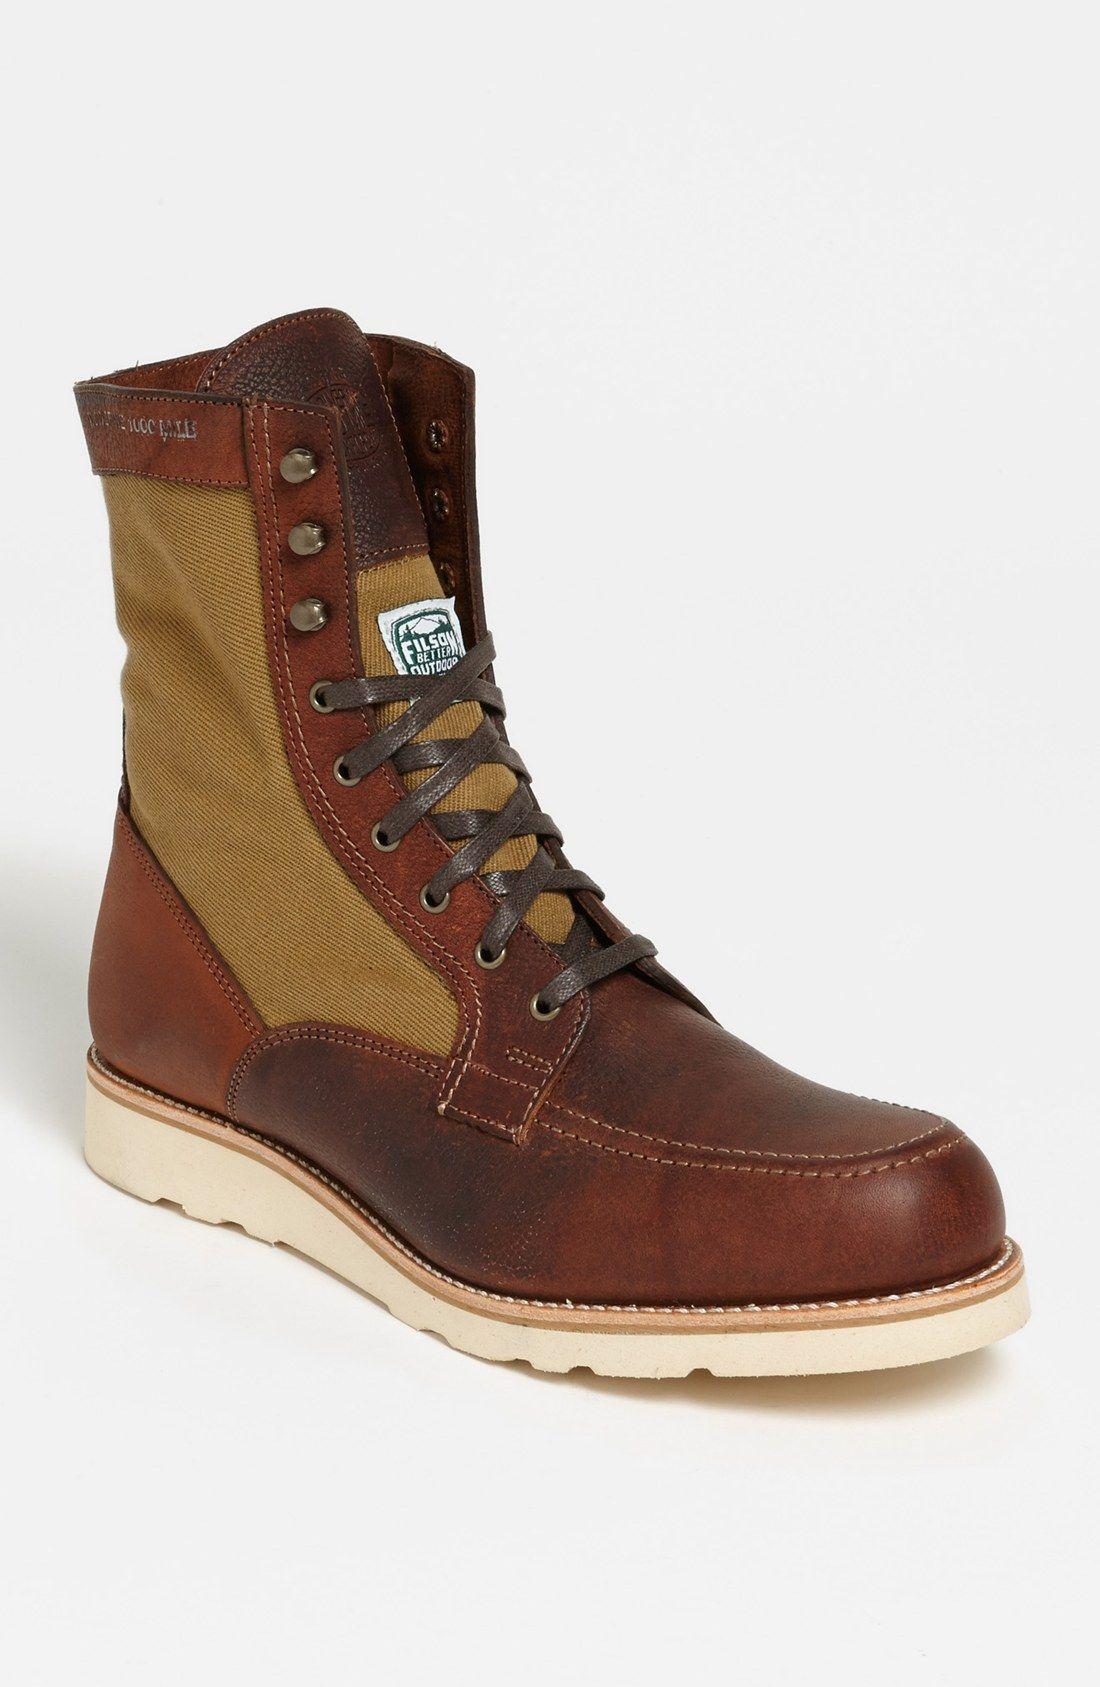 24538c235b6 Ugg Boots Thomastown